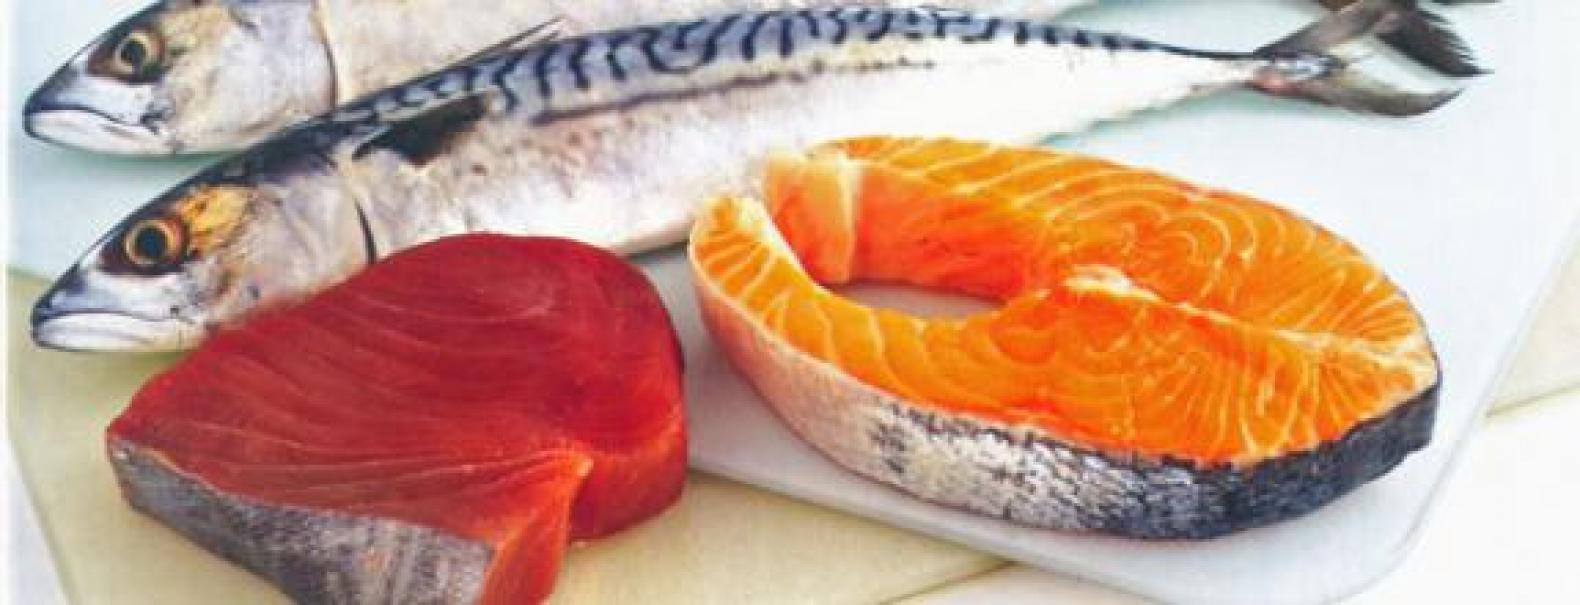 Resep Bakso Ikan Tongkol